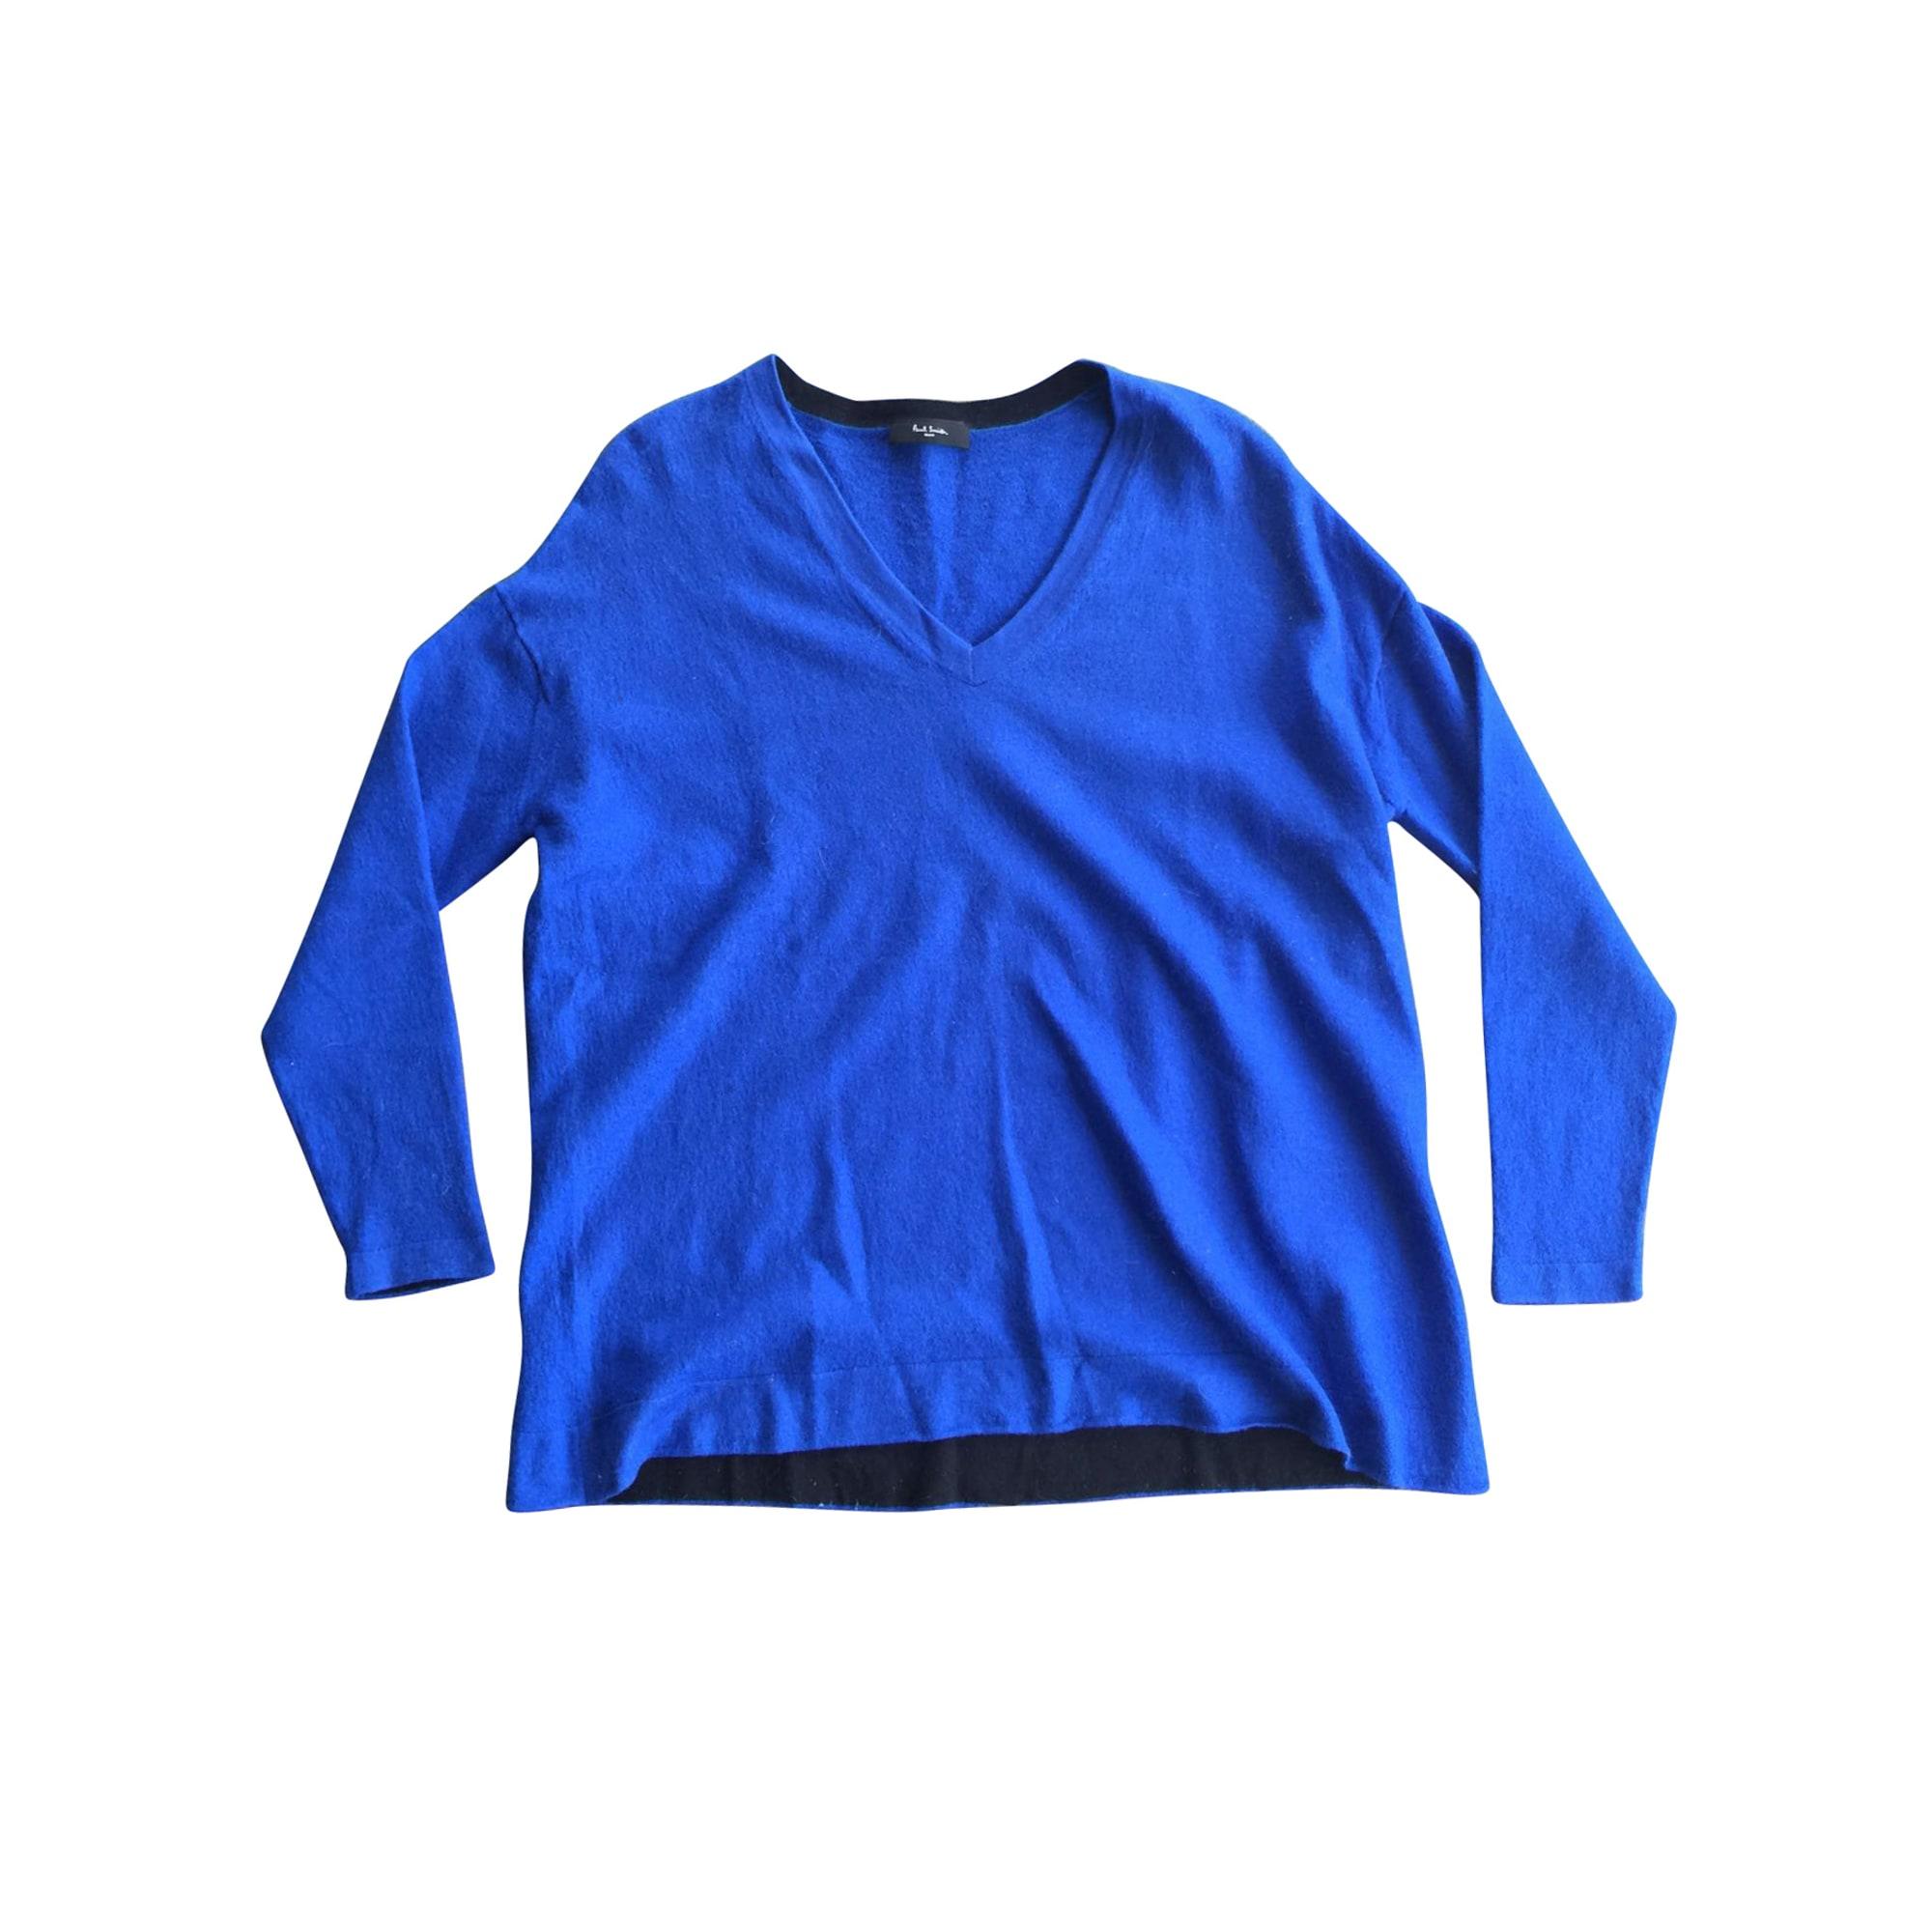 Pull PAUL SMITH Bleu, bleu marine, bleu turquoise